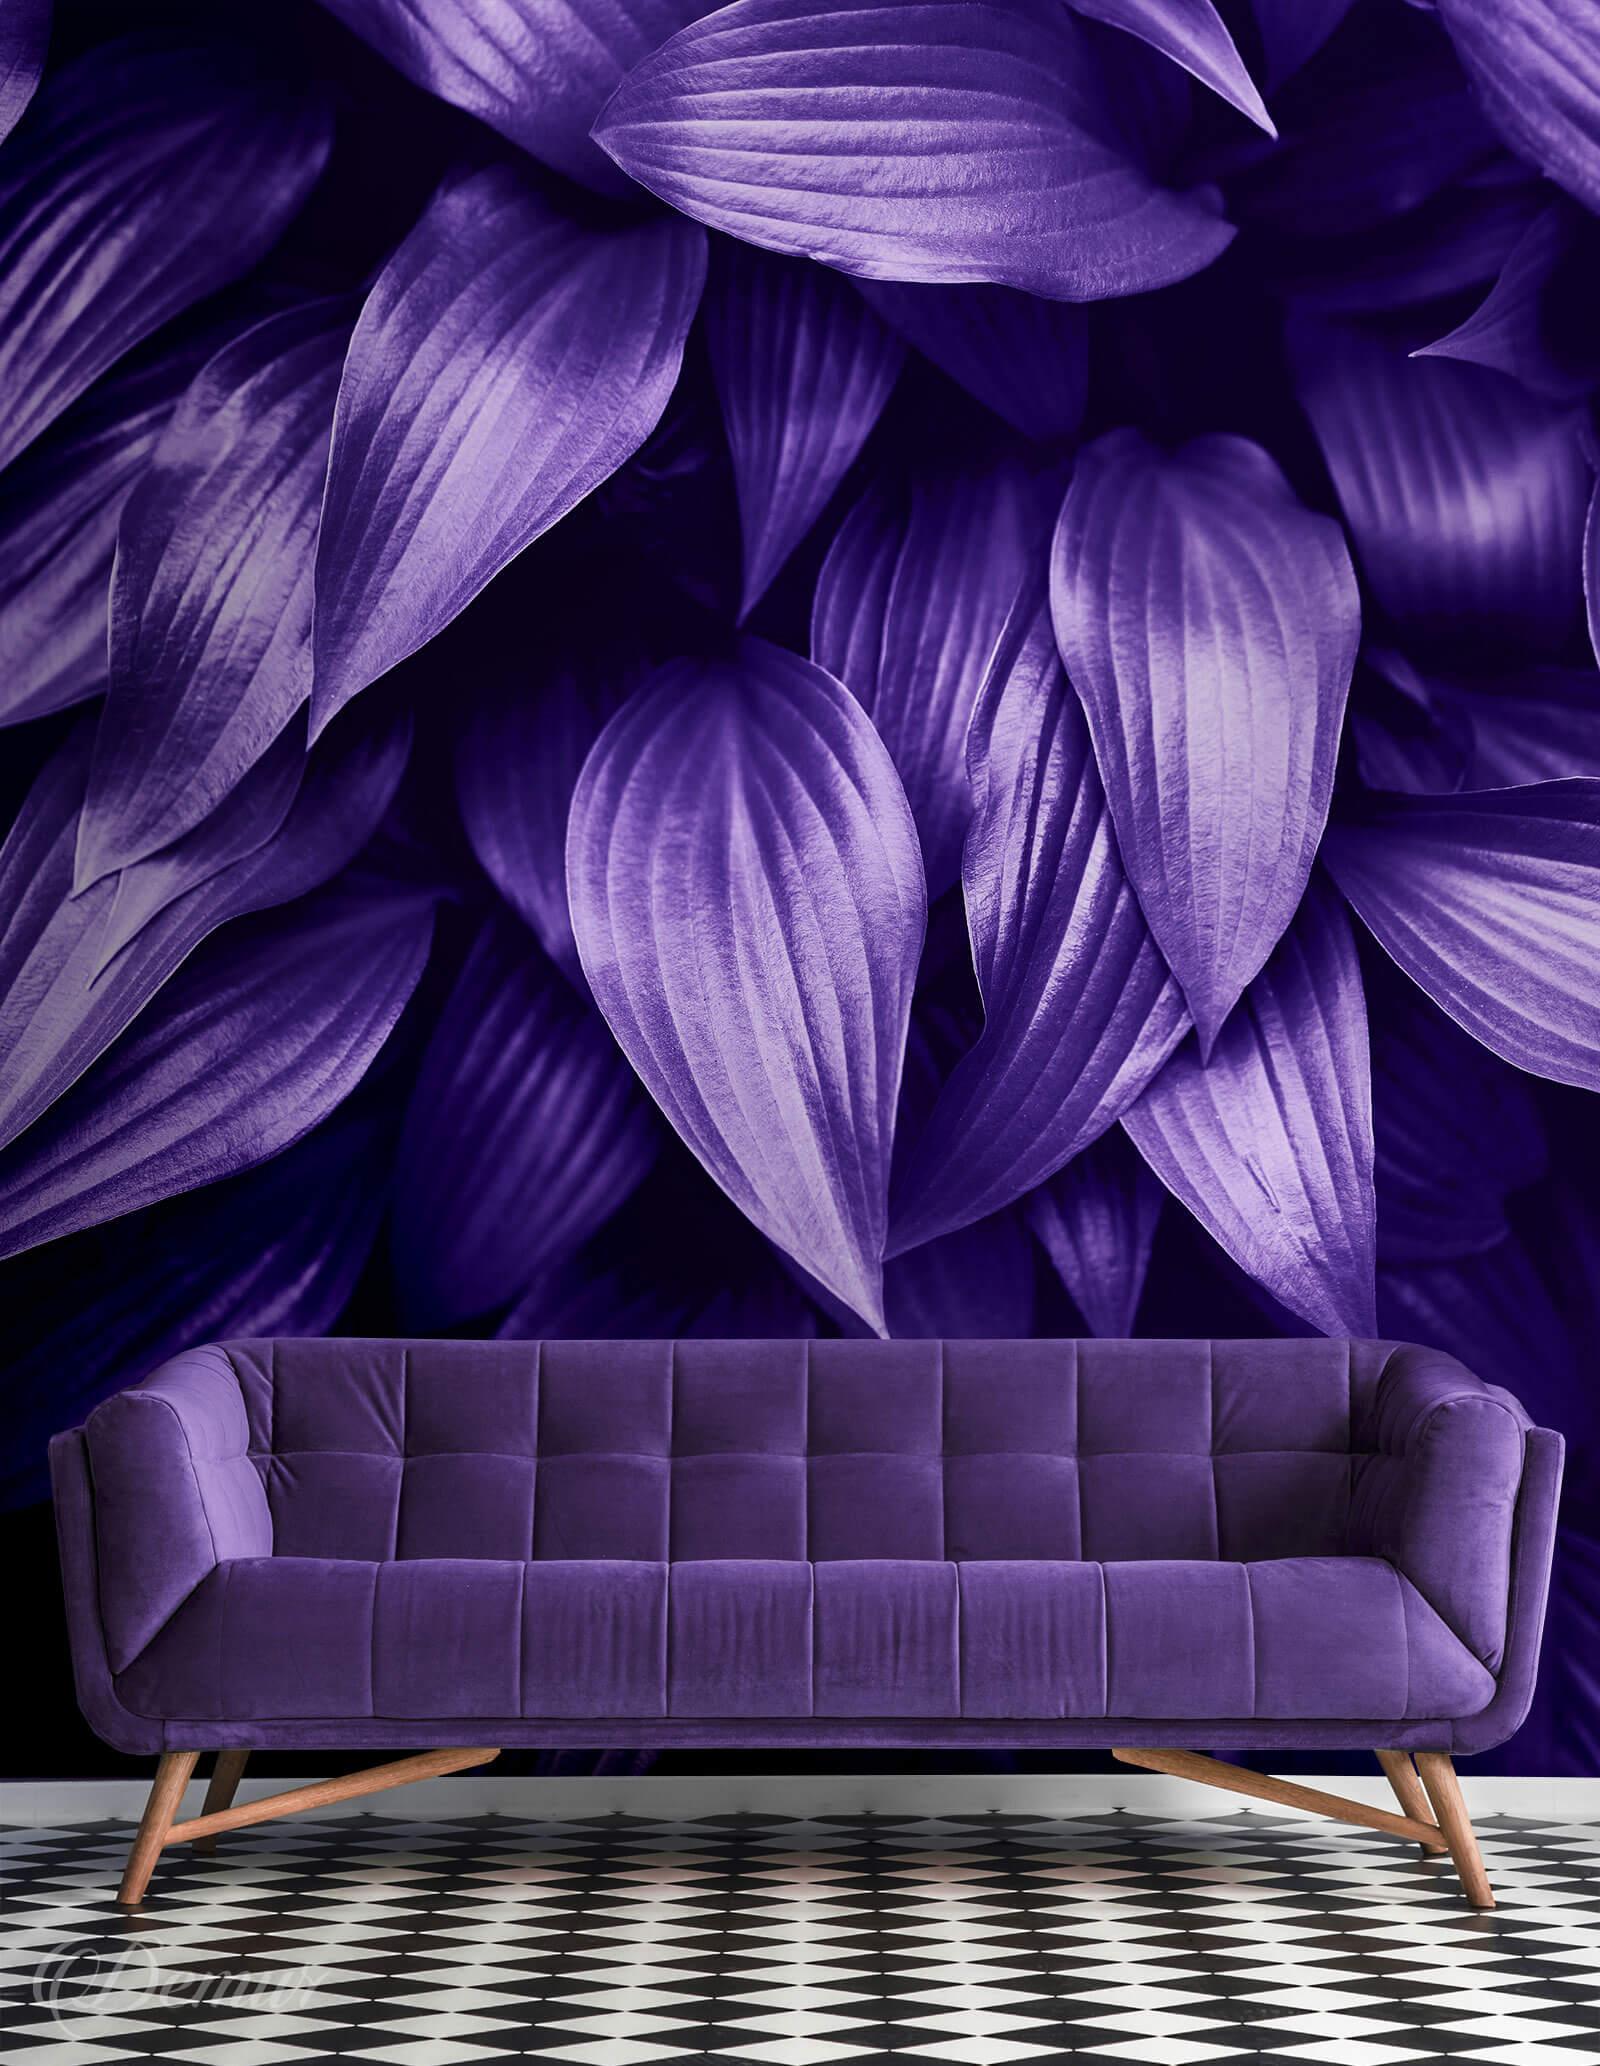 Fototapeta Liście w ultrafiolecie - Fototapeta fioletowa - Demur